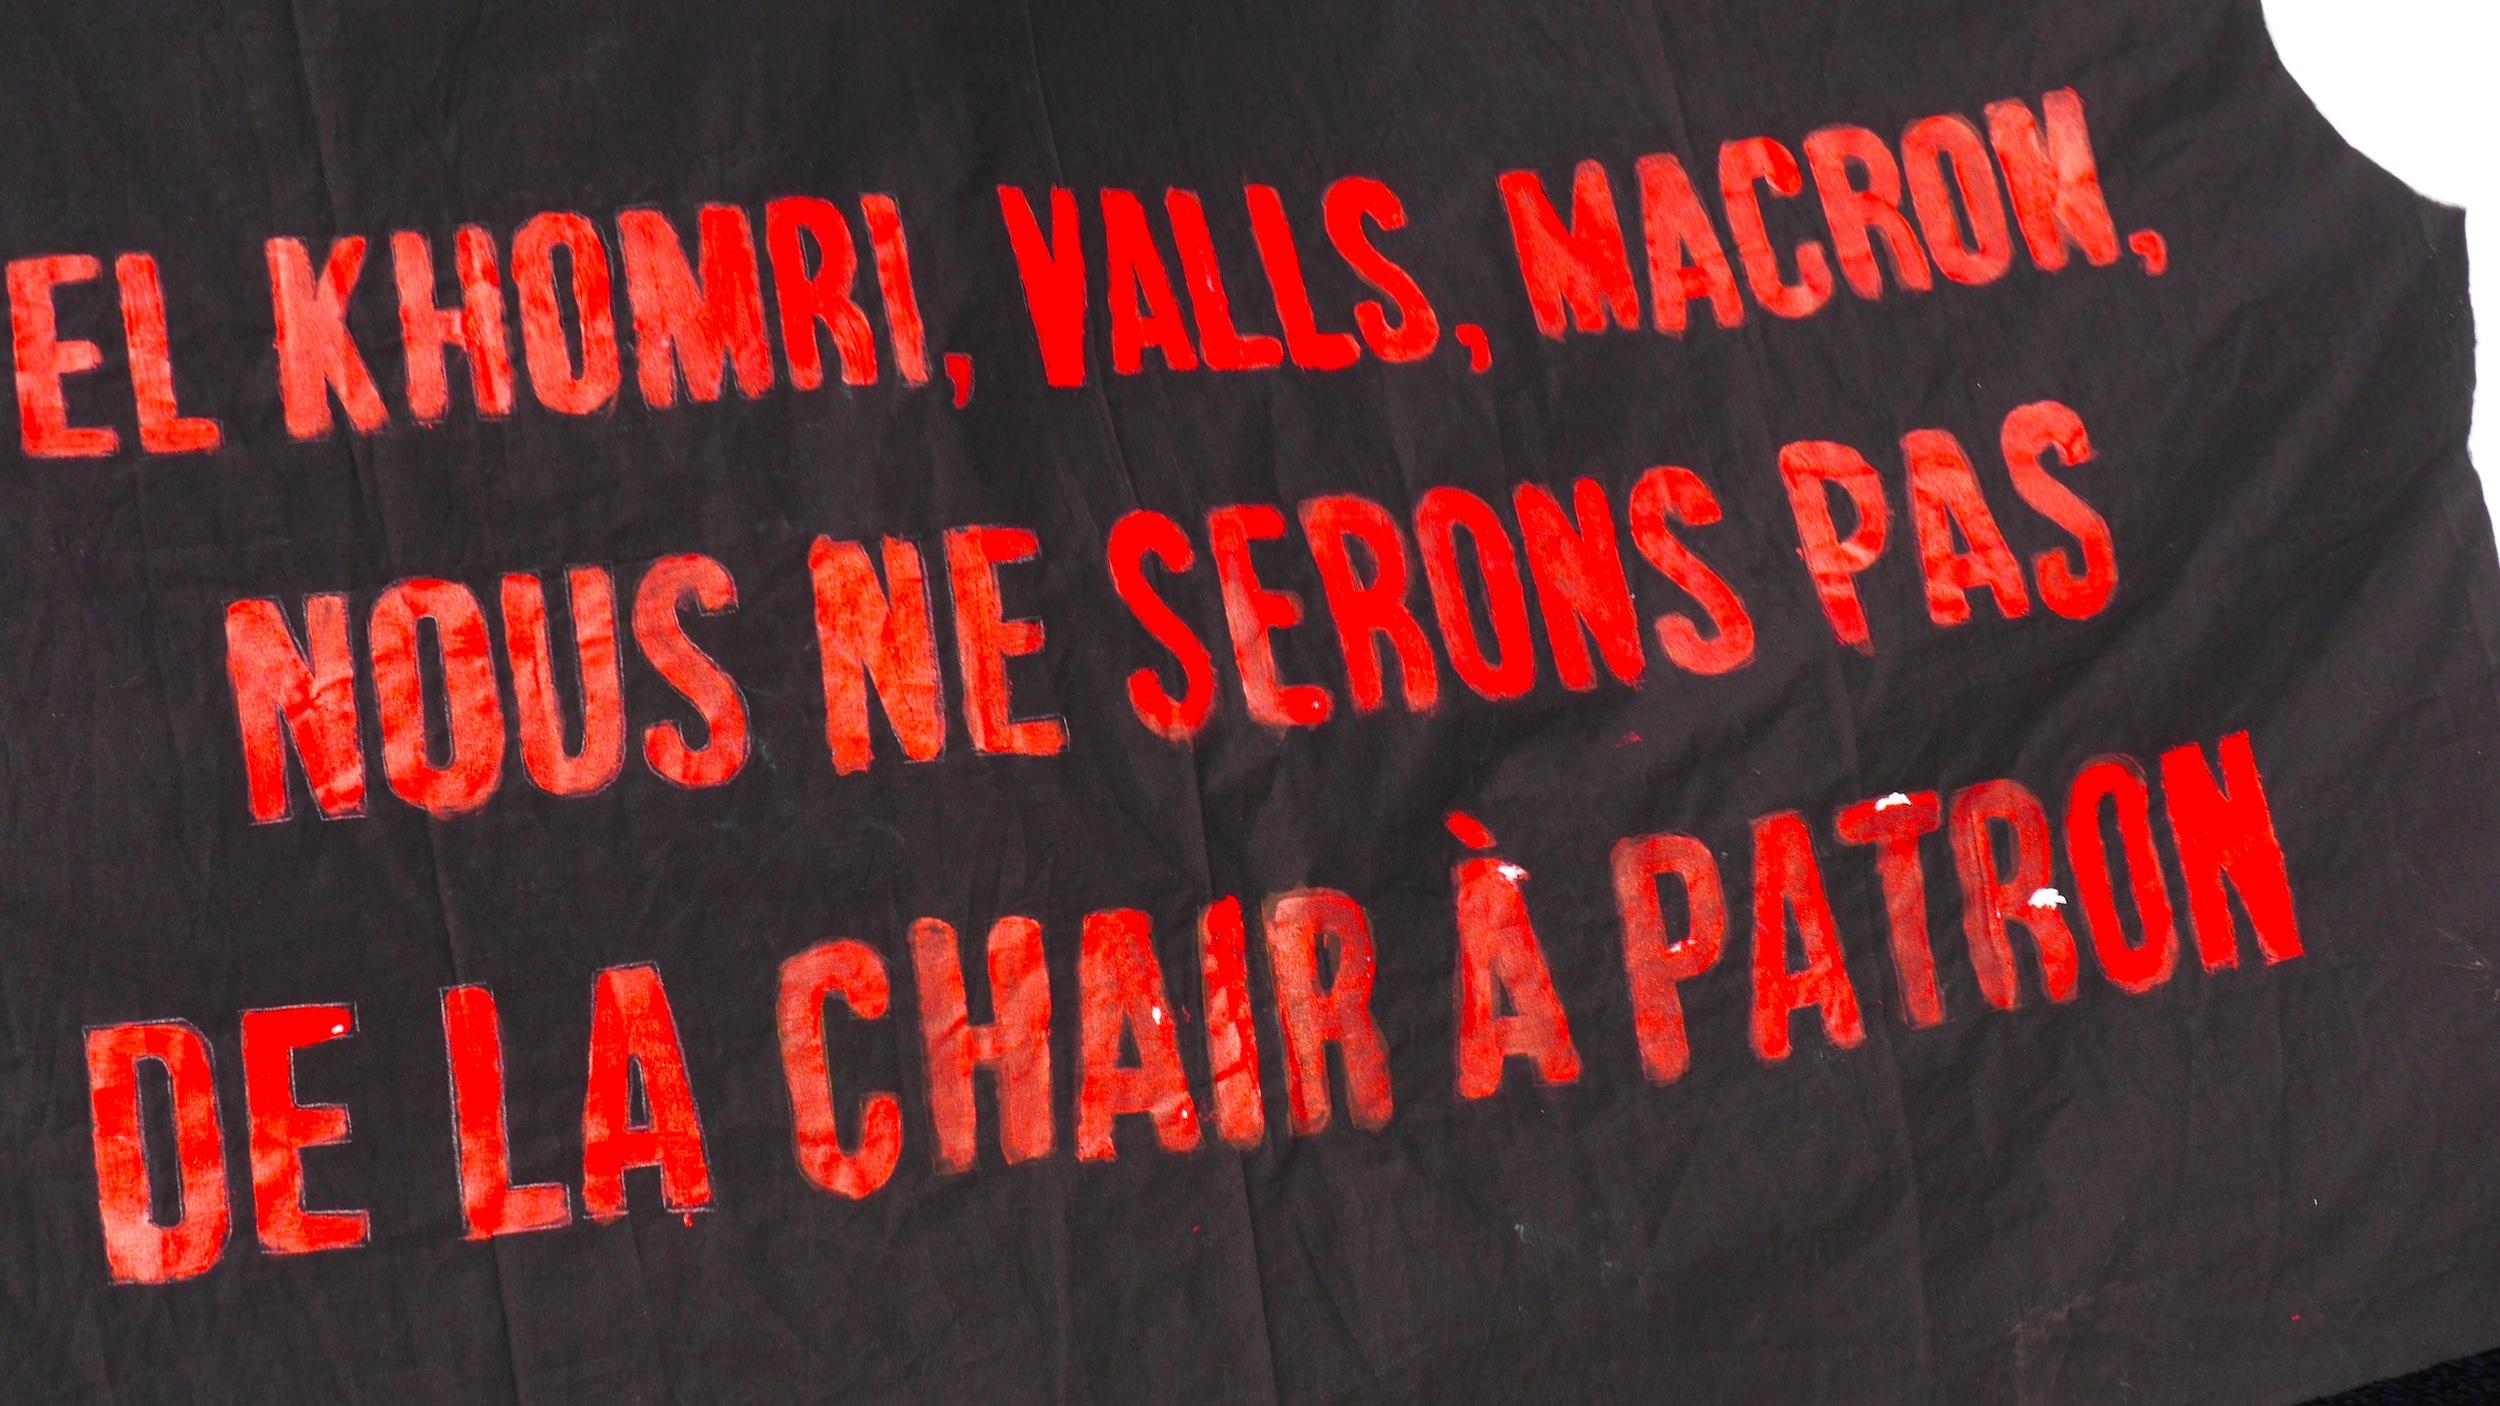 «El Khomri, Valls, Macron. Nous ne serons pas de la chair à patron.»